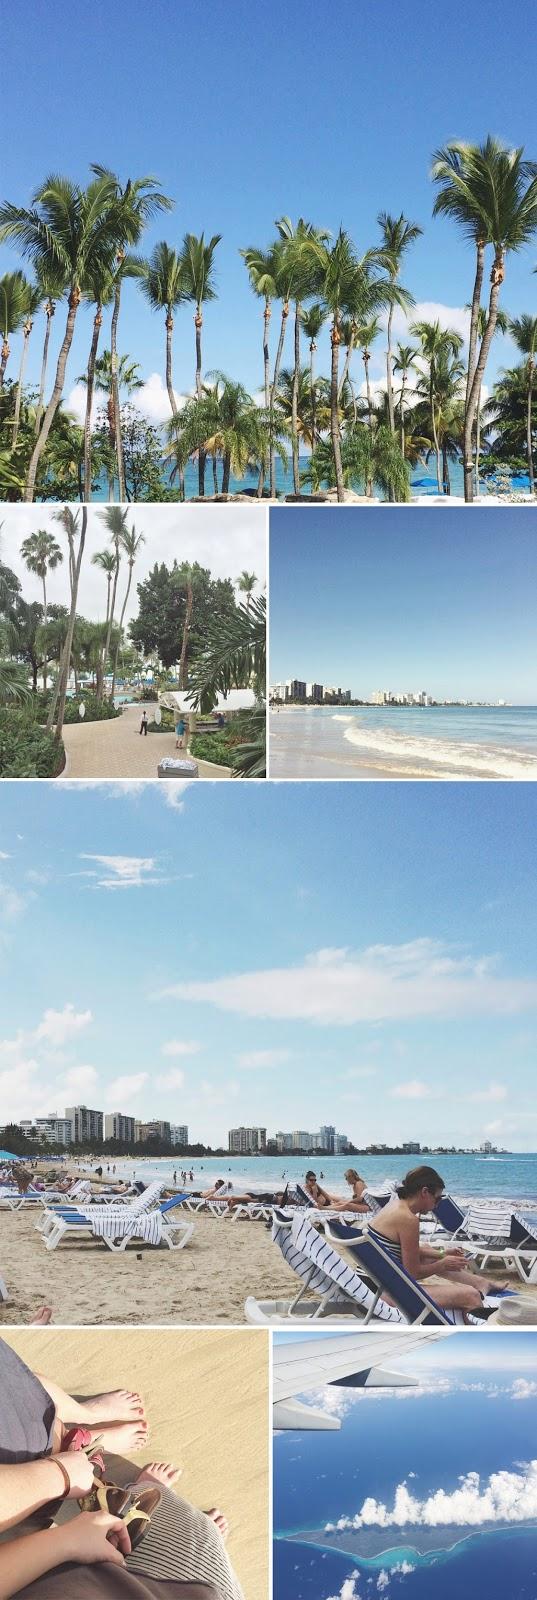 Puerto-Rico-Trip-The-Beaches